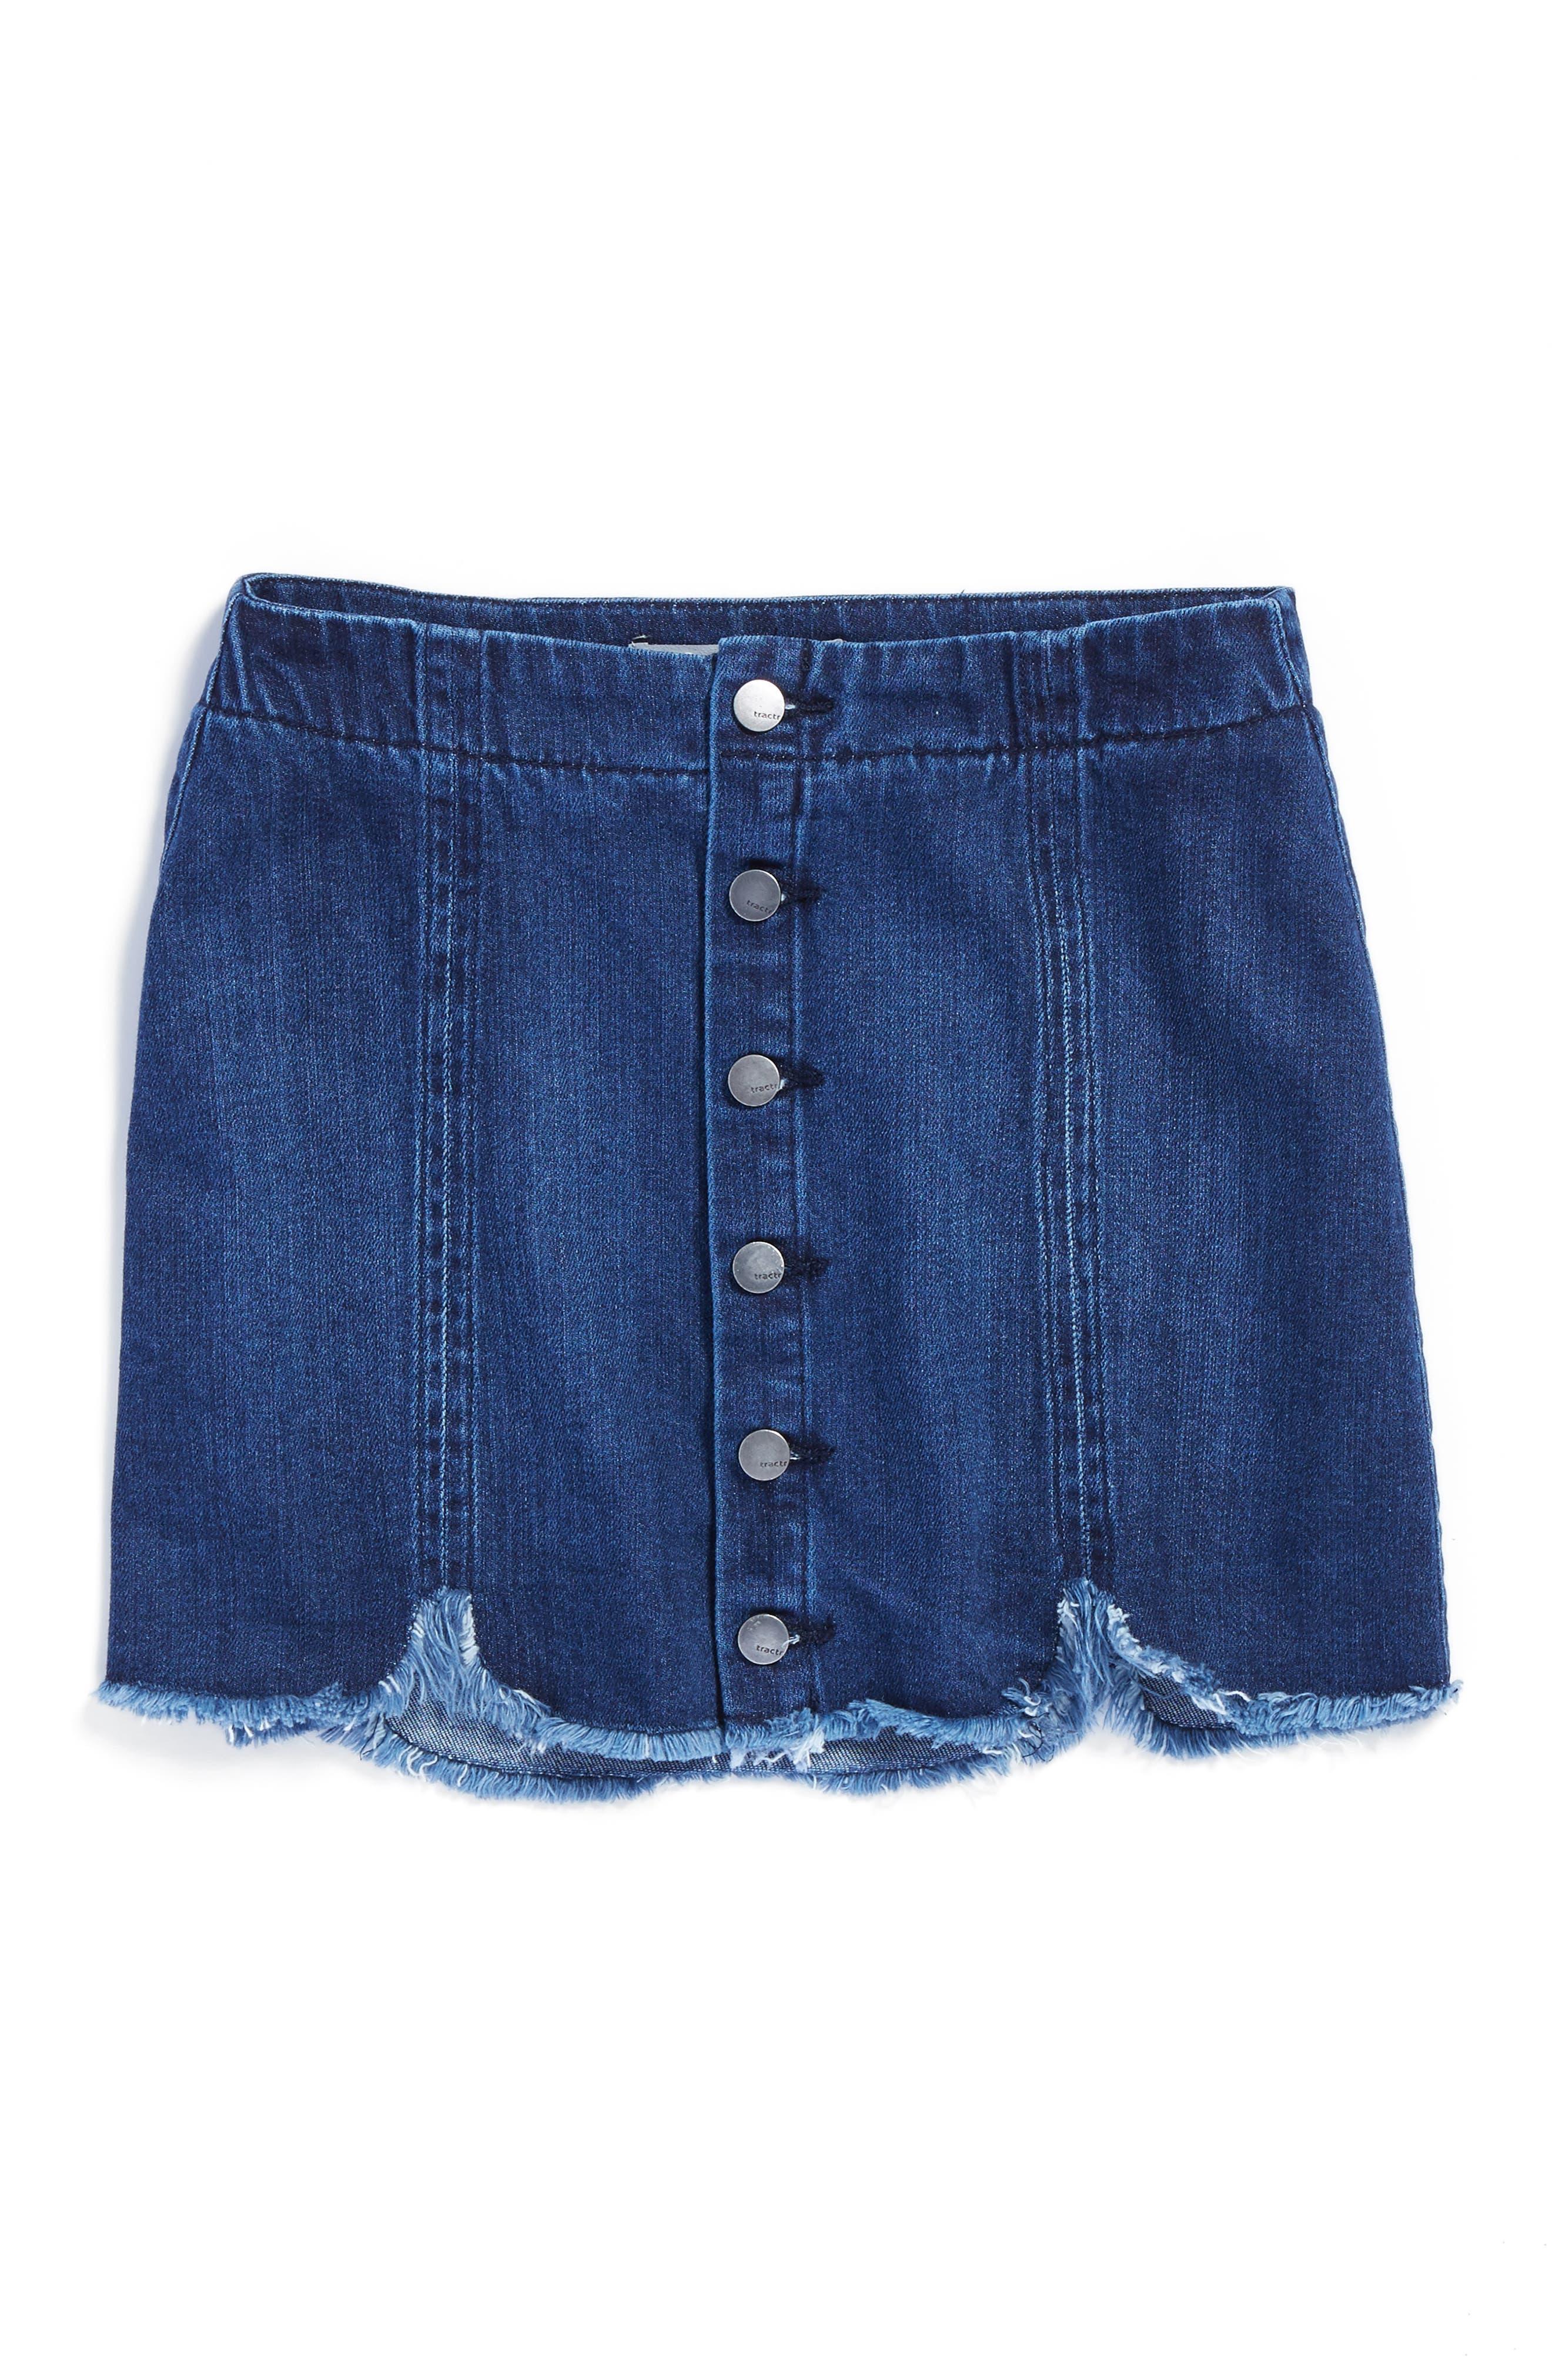 Frayed Scallop Denim Skirt,                             Main thumbnail 1, color,                             407